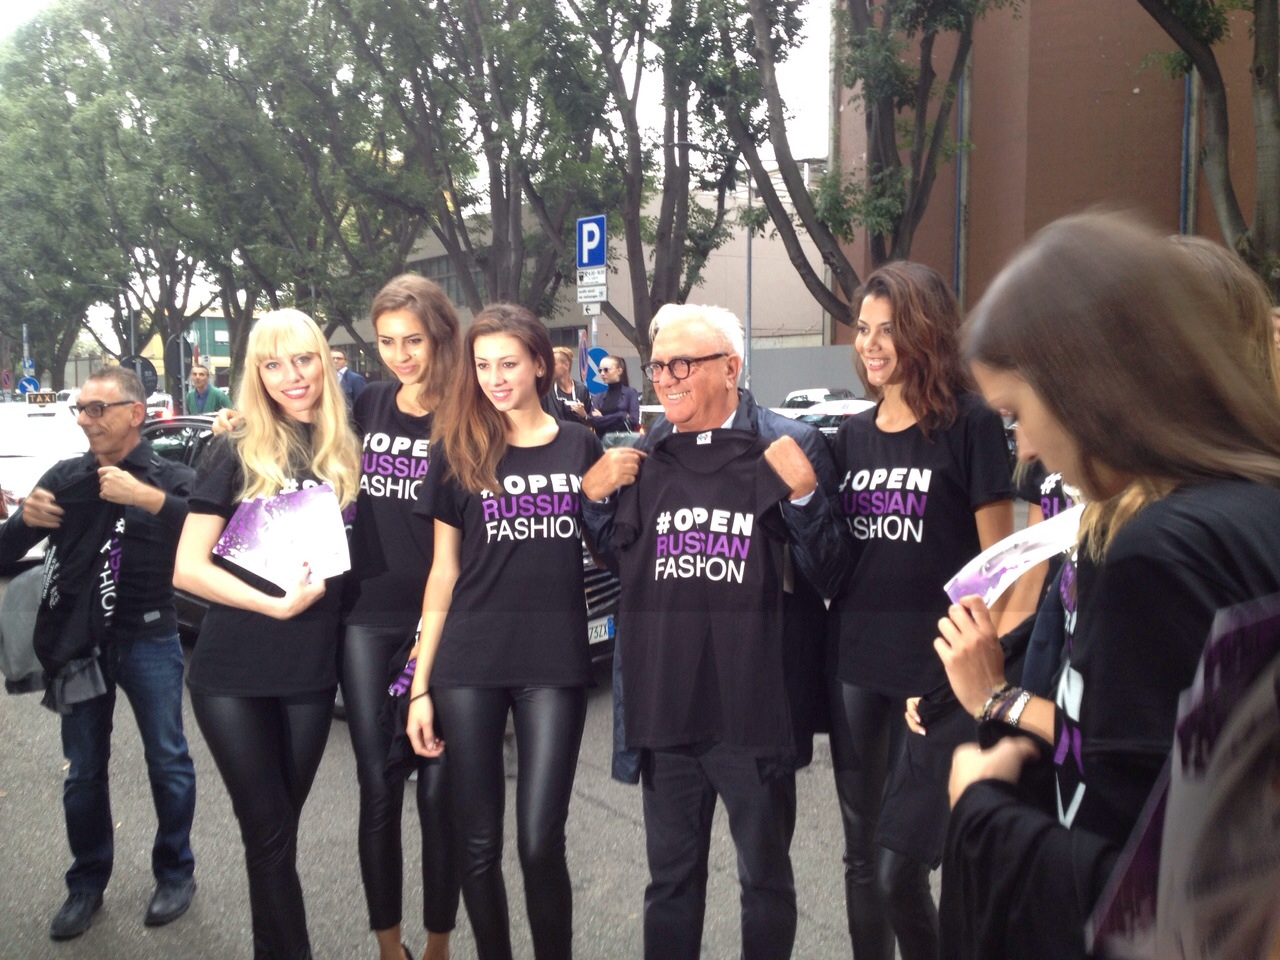 #OpenRussianFashion flashmob Super Milan Italy